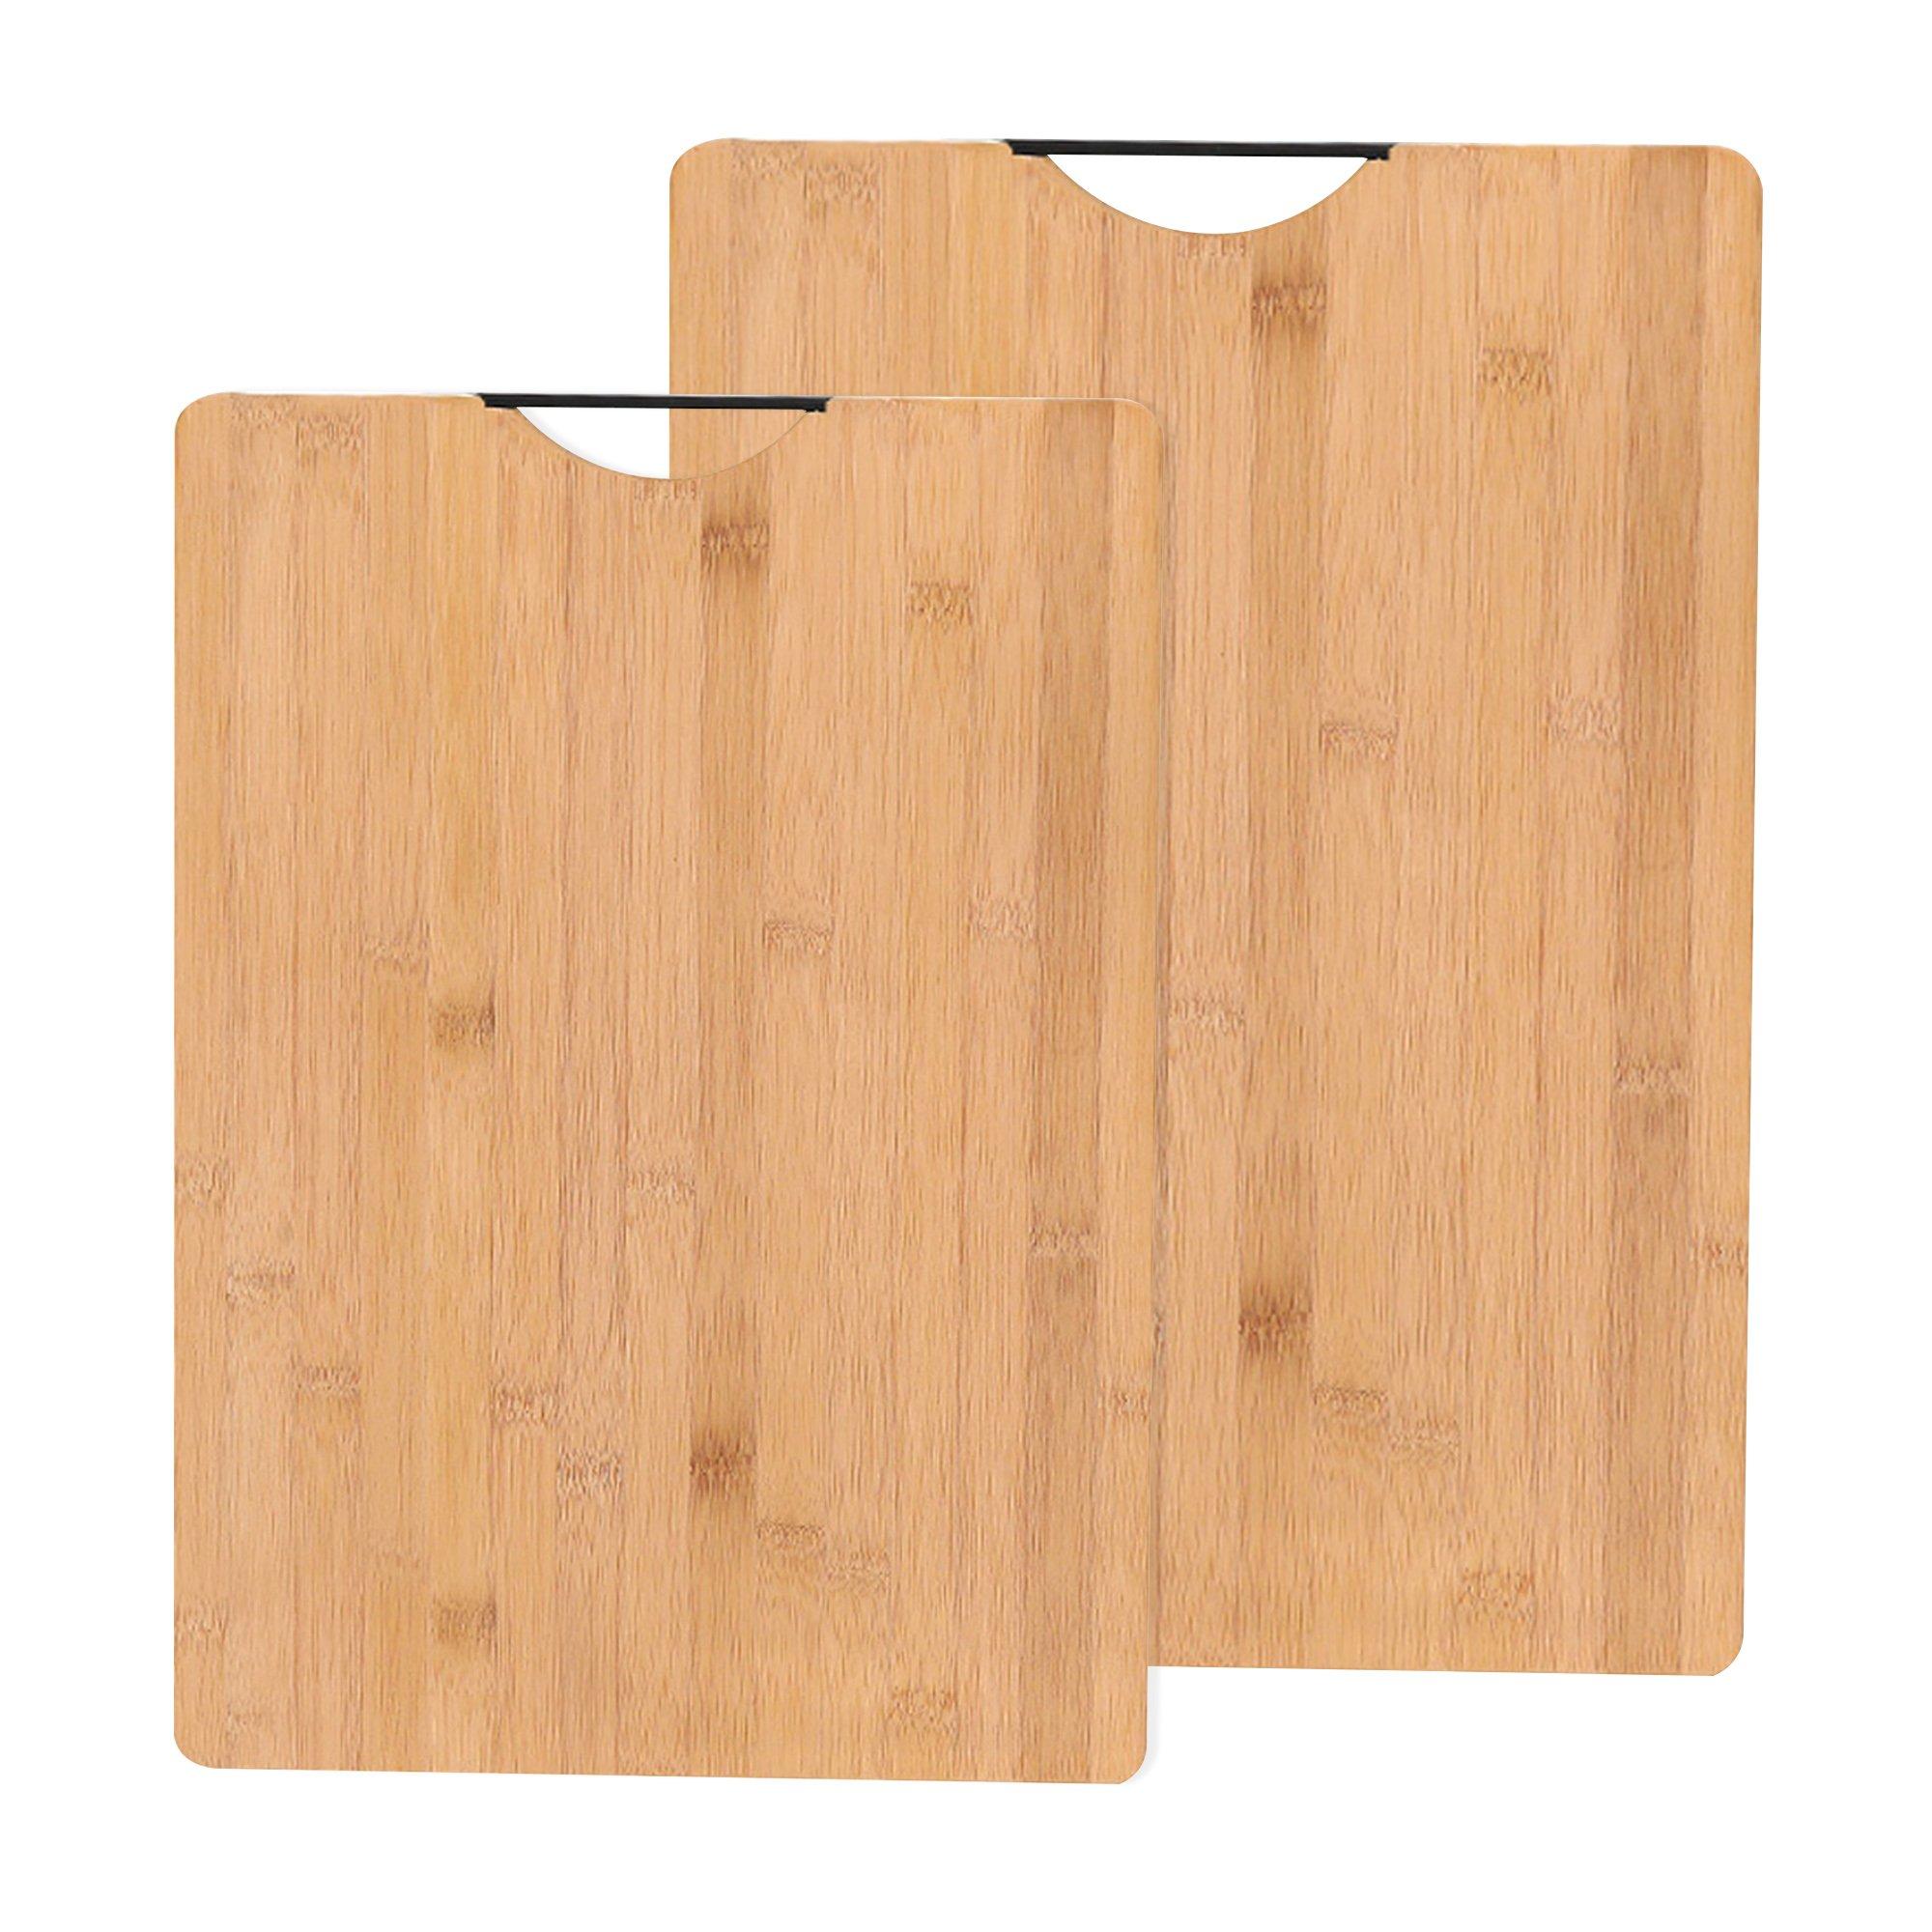 Bamboo Chopping Board 2Pcs Set